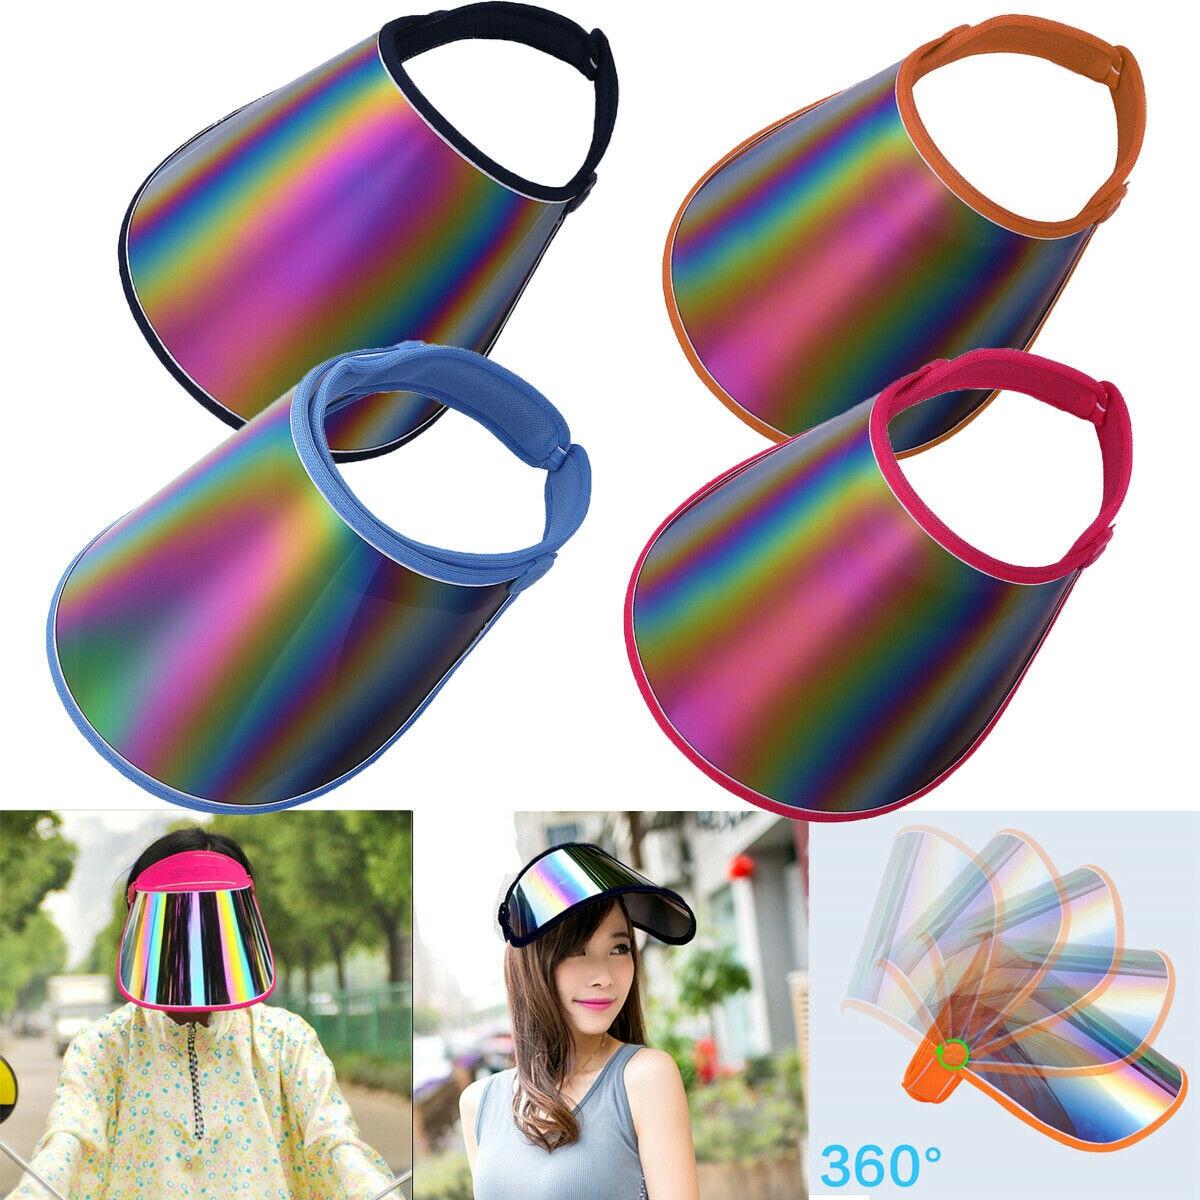 Unisex Summer Sun Visor UV Protection Casual Plastic Hat Sunscreen Cap Sunhat